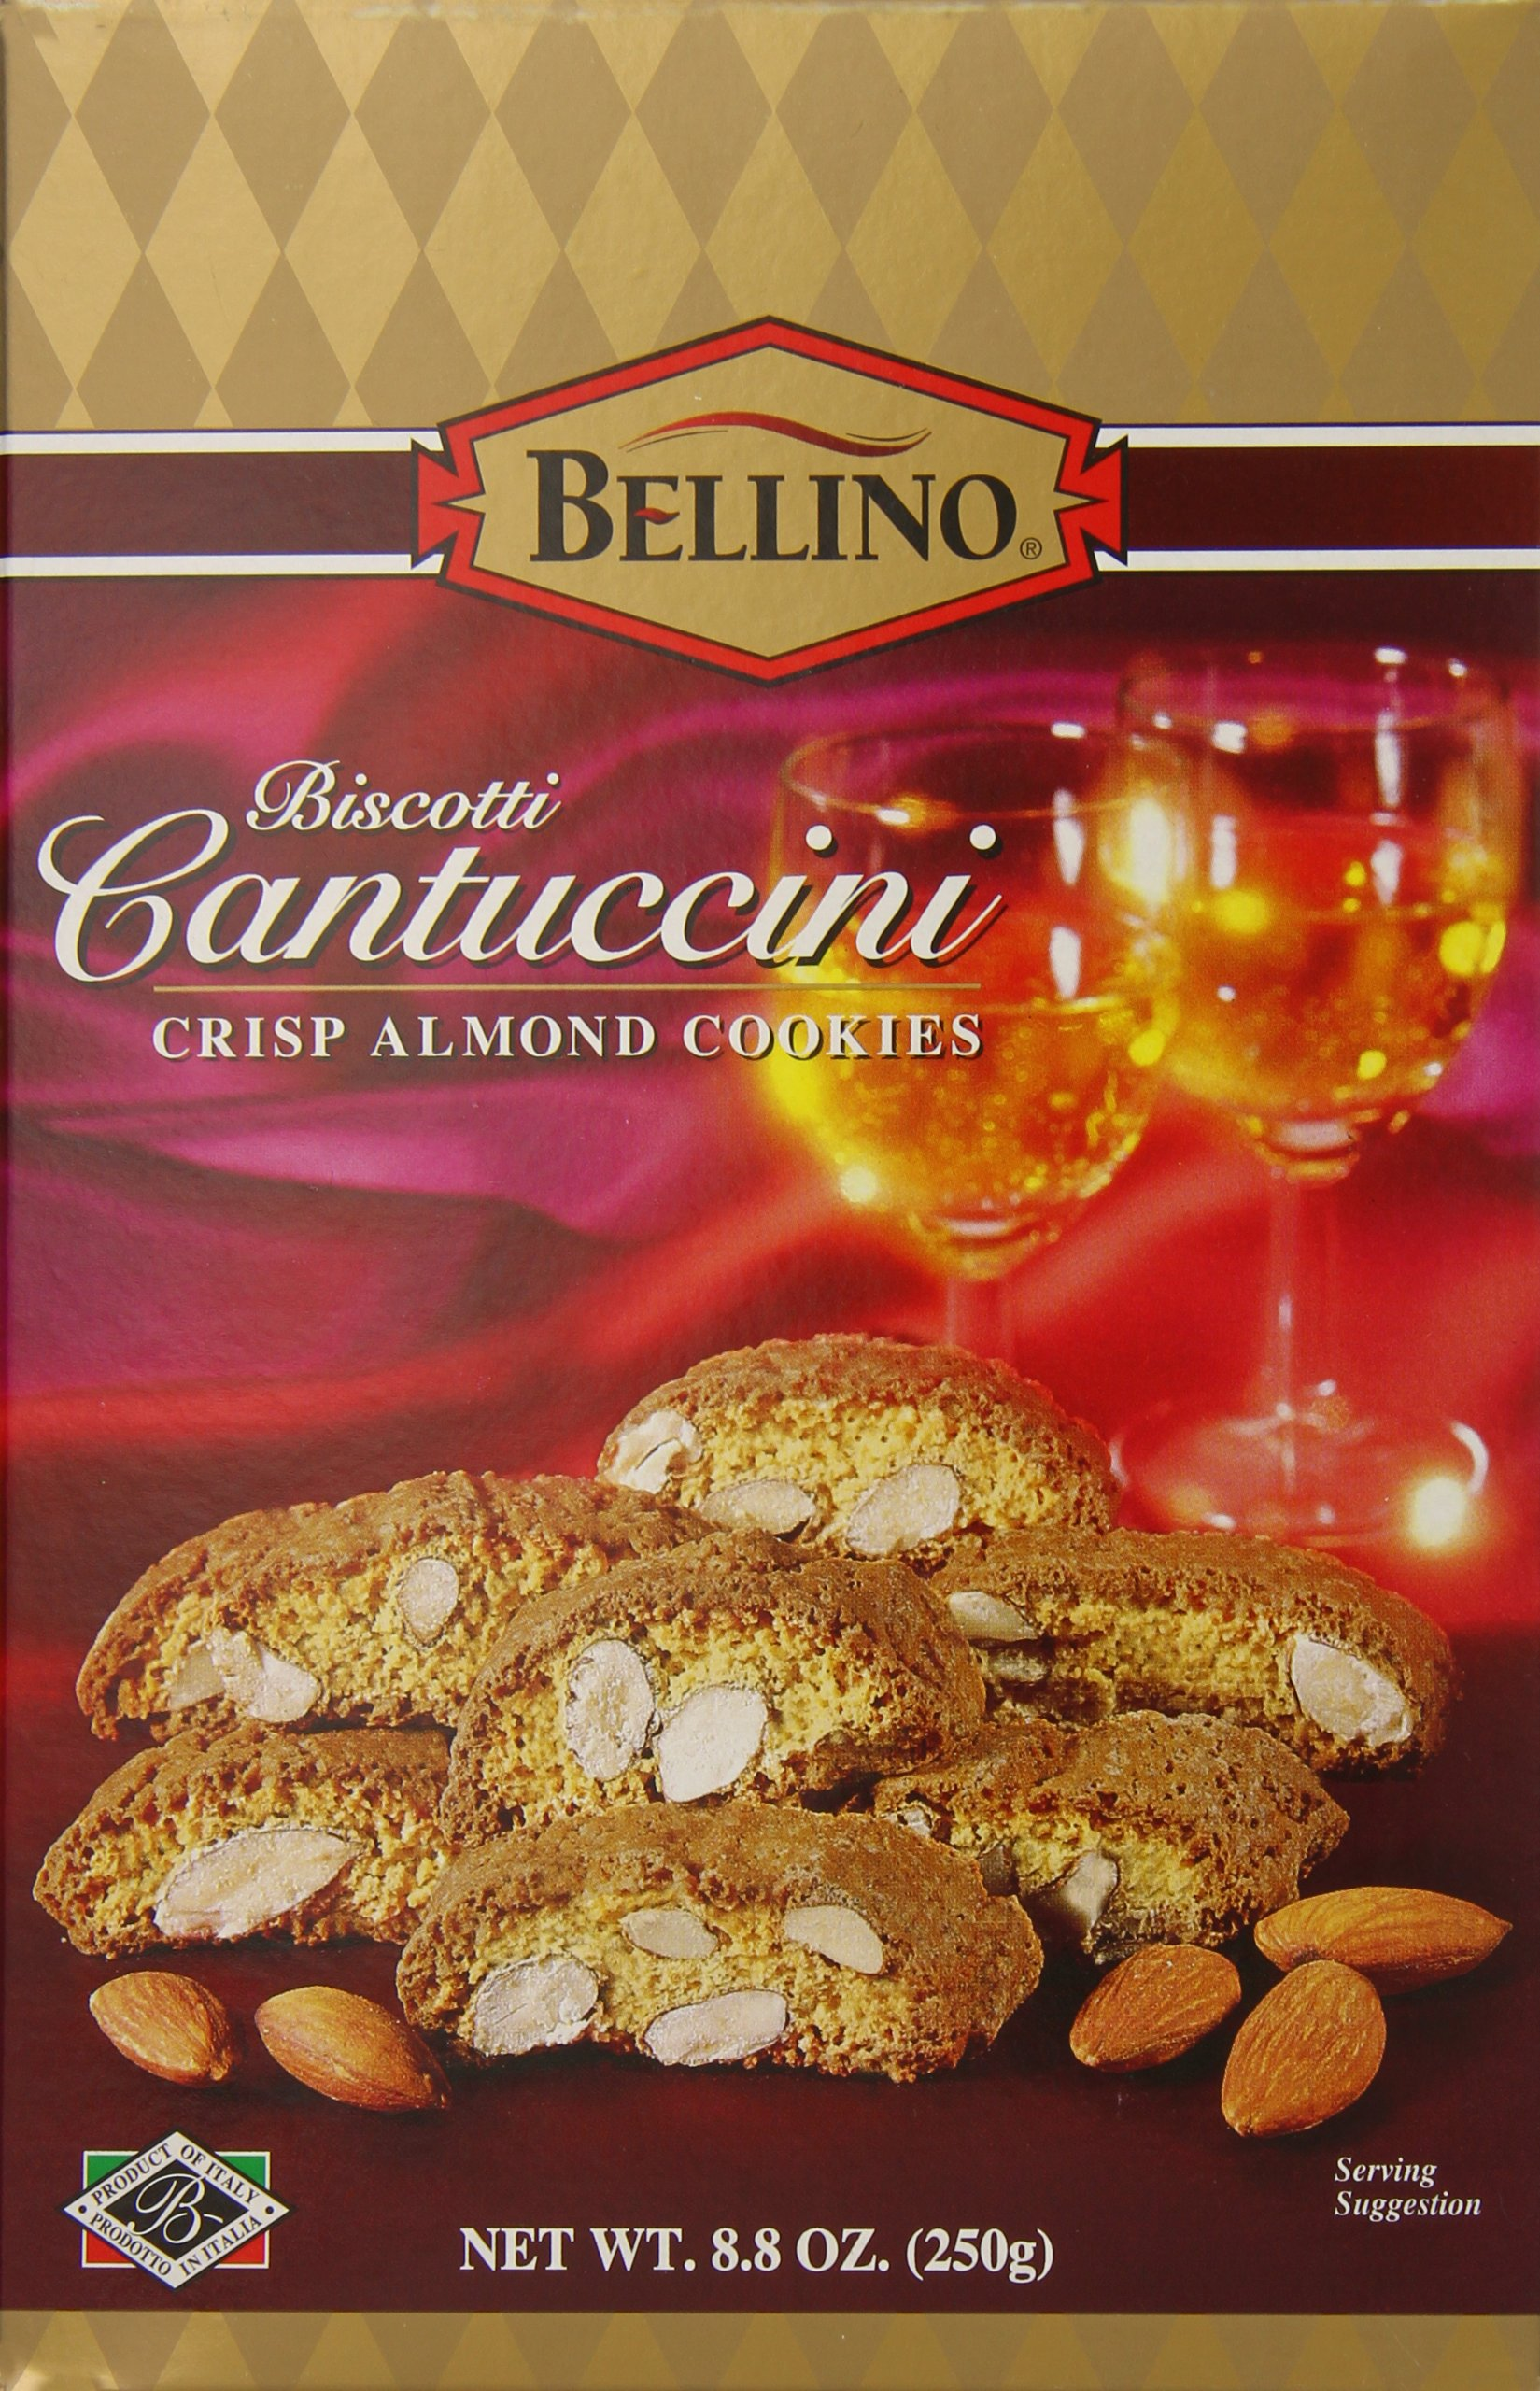 Bellino Biscotti Cantuccini Crisp Almond Cookies, 8.8 Ounce Box